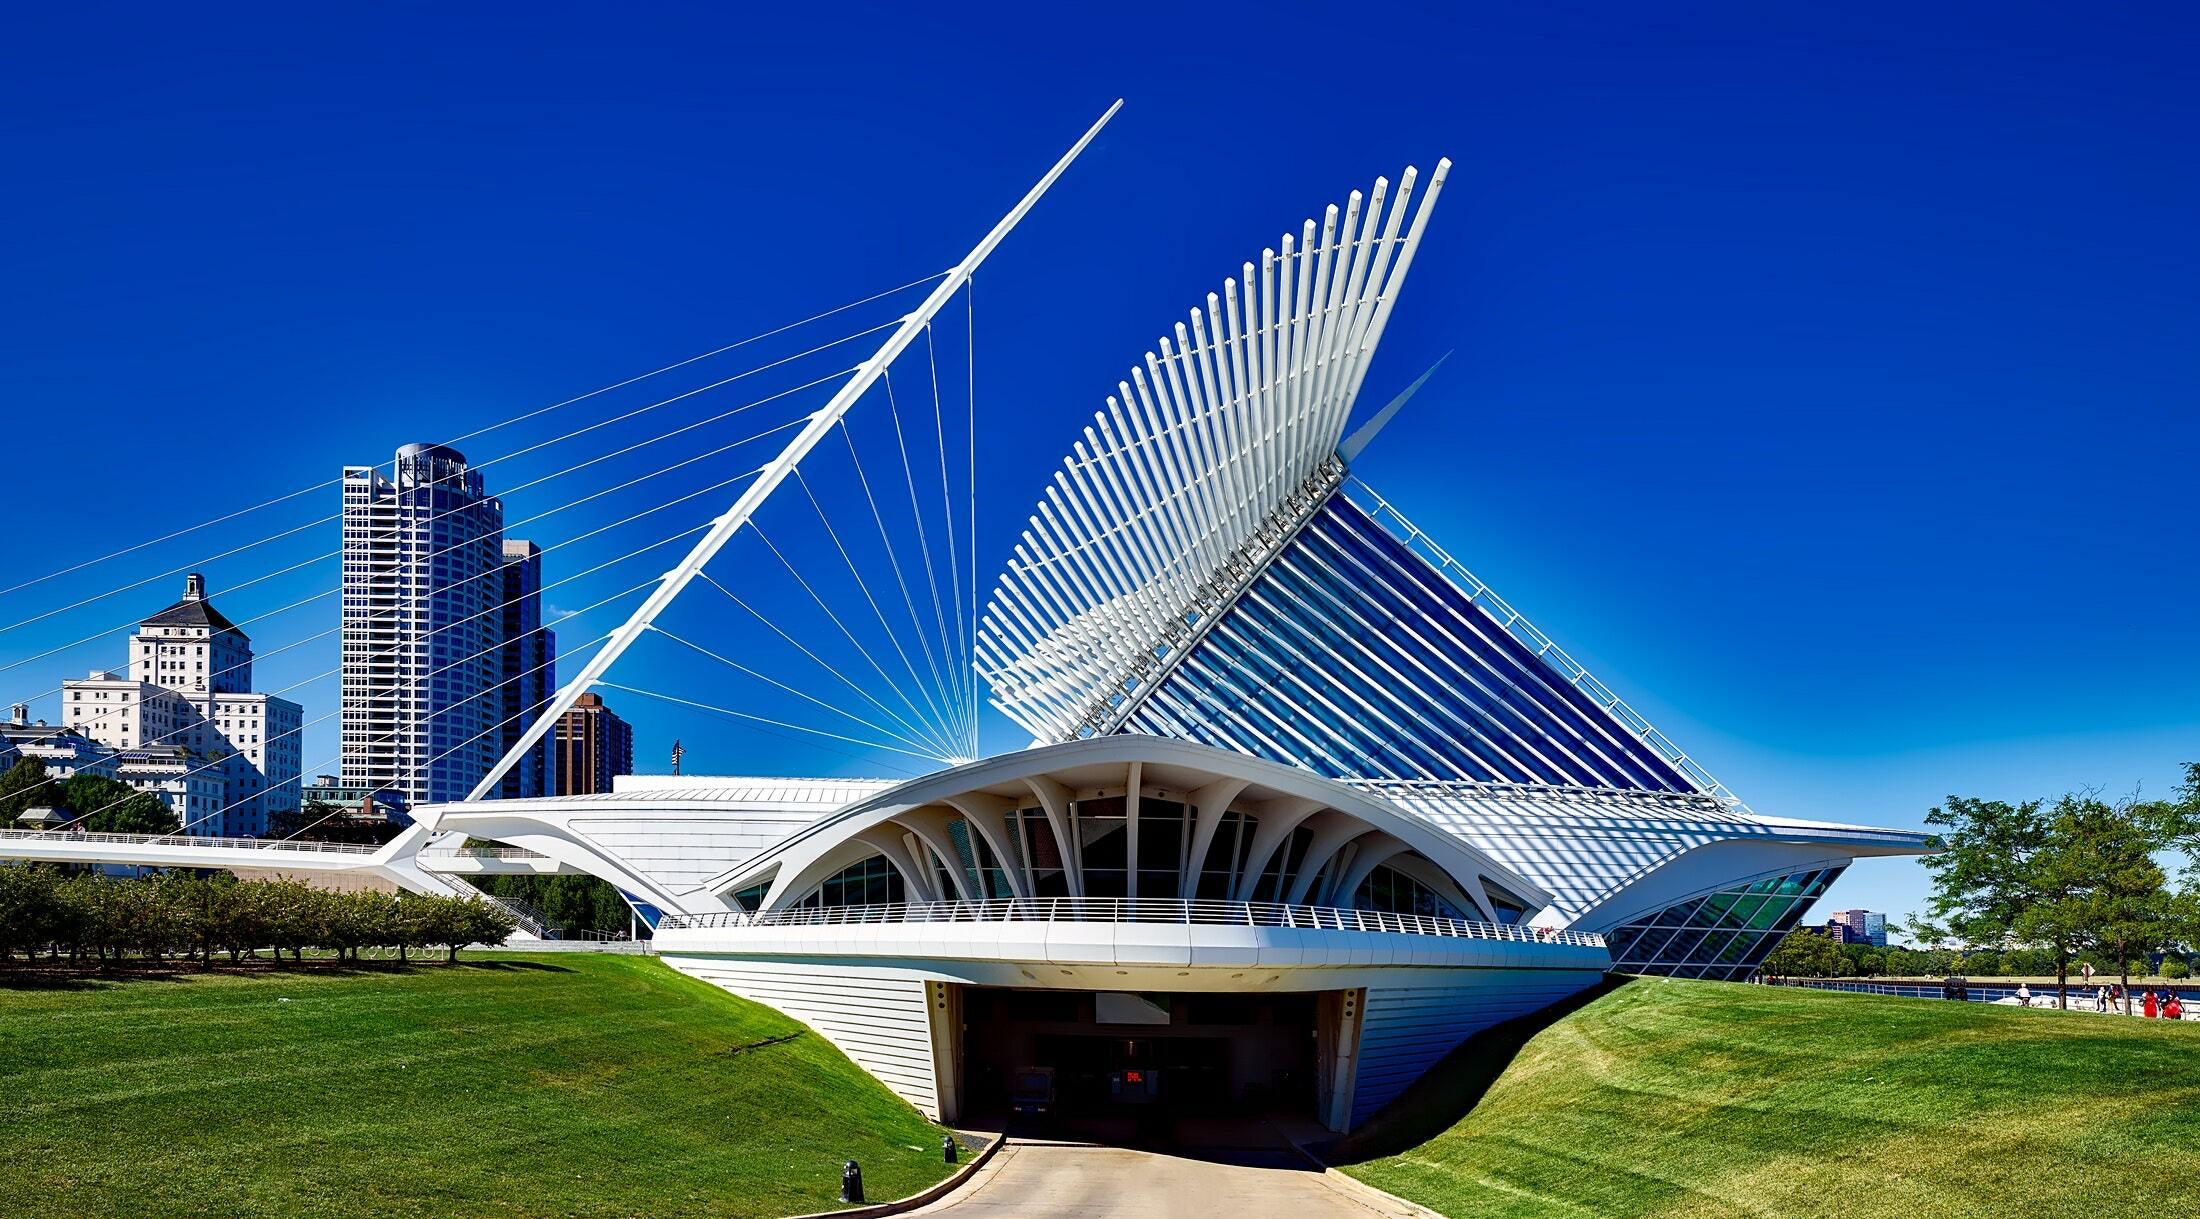 architectural-design-architecture-art-museum-236449